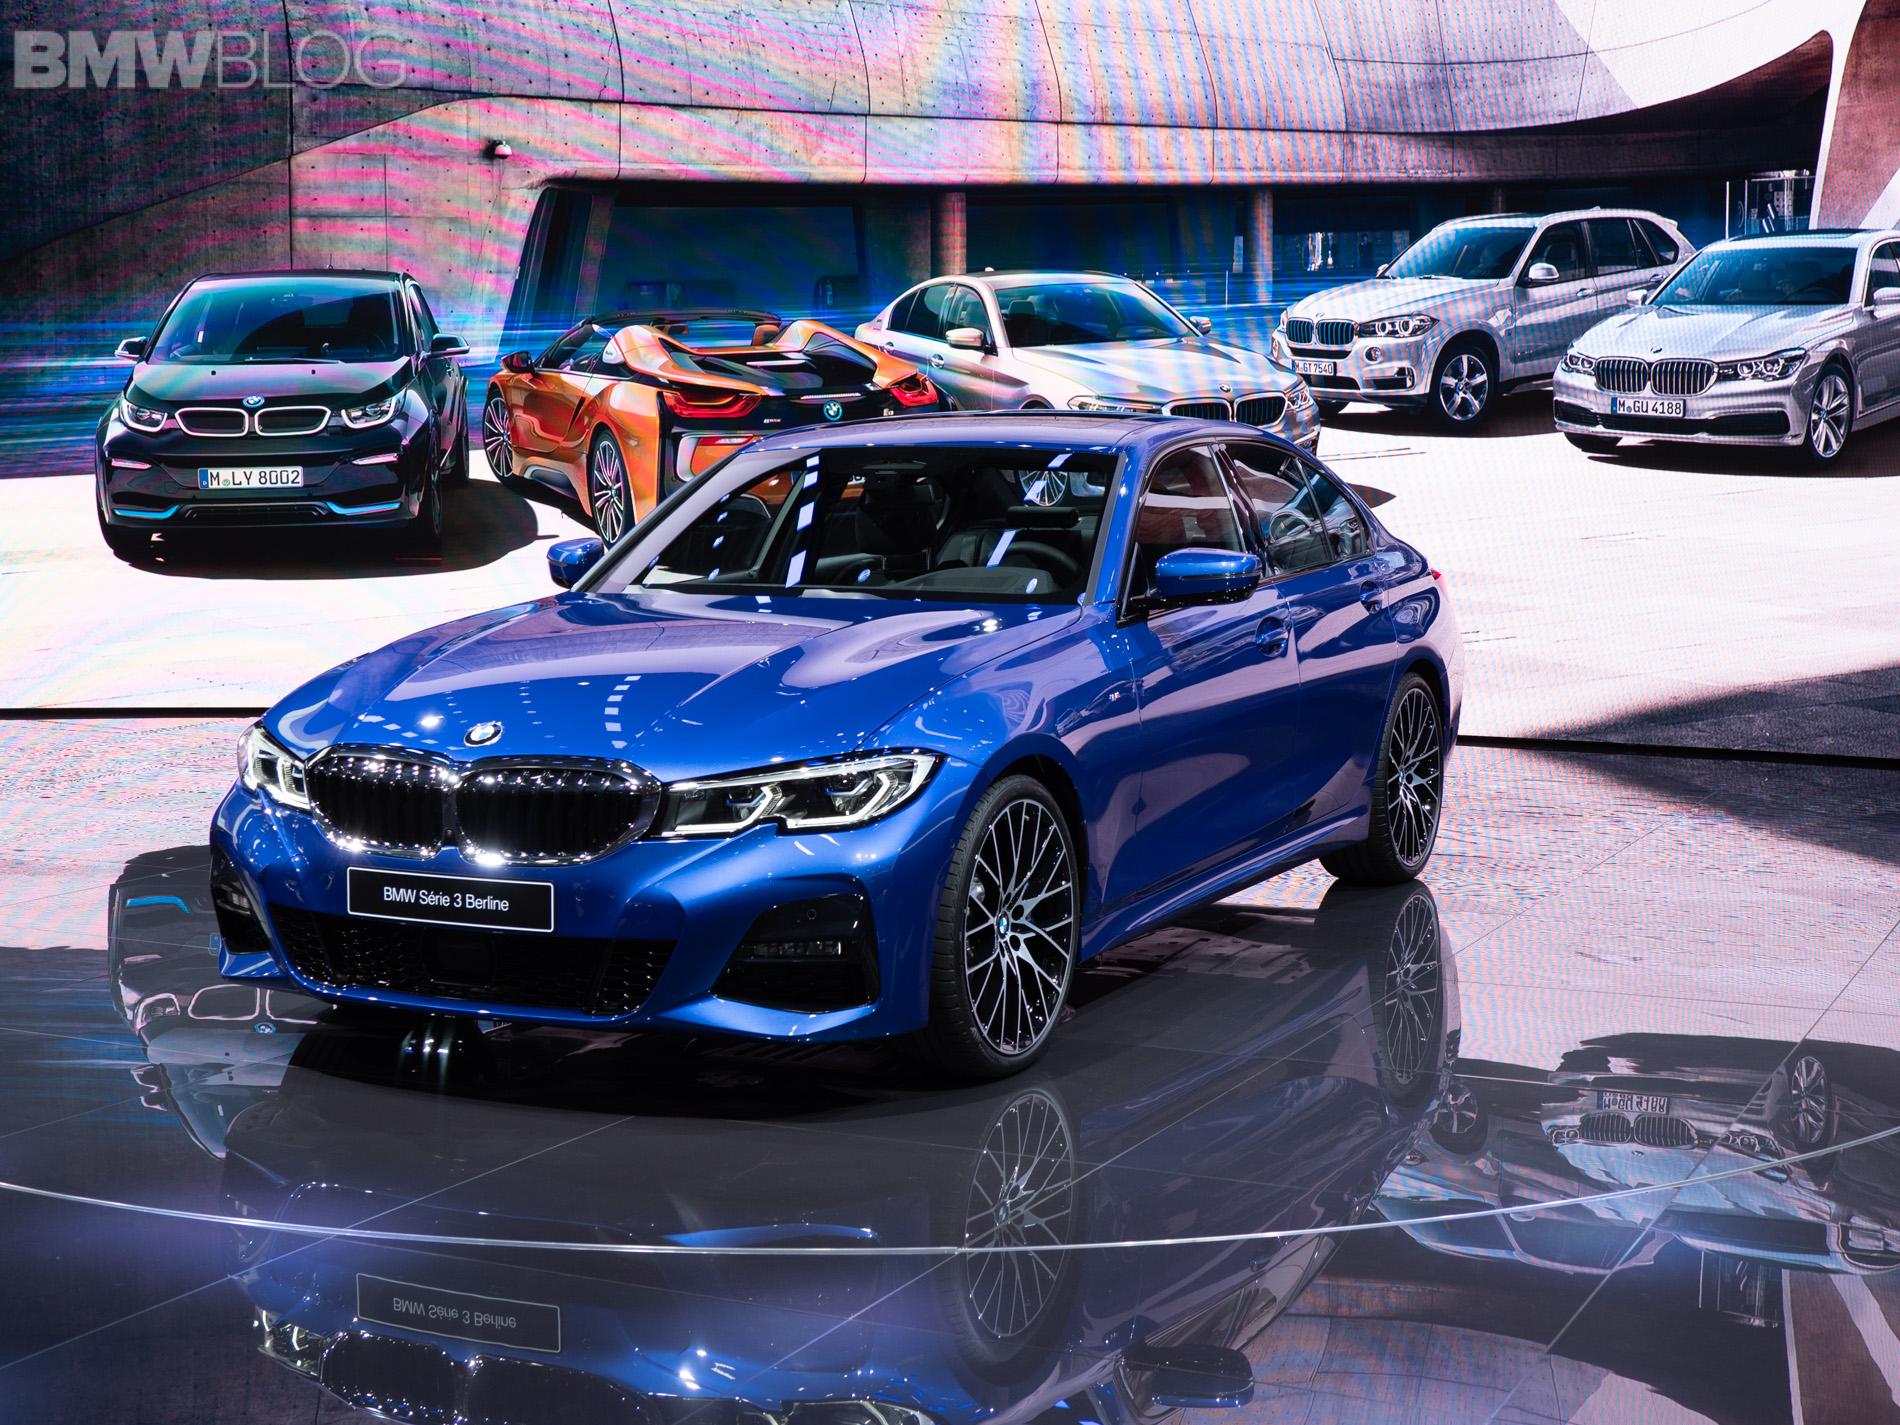 2019 BMW 3 Series Paris Motor Show 45